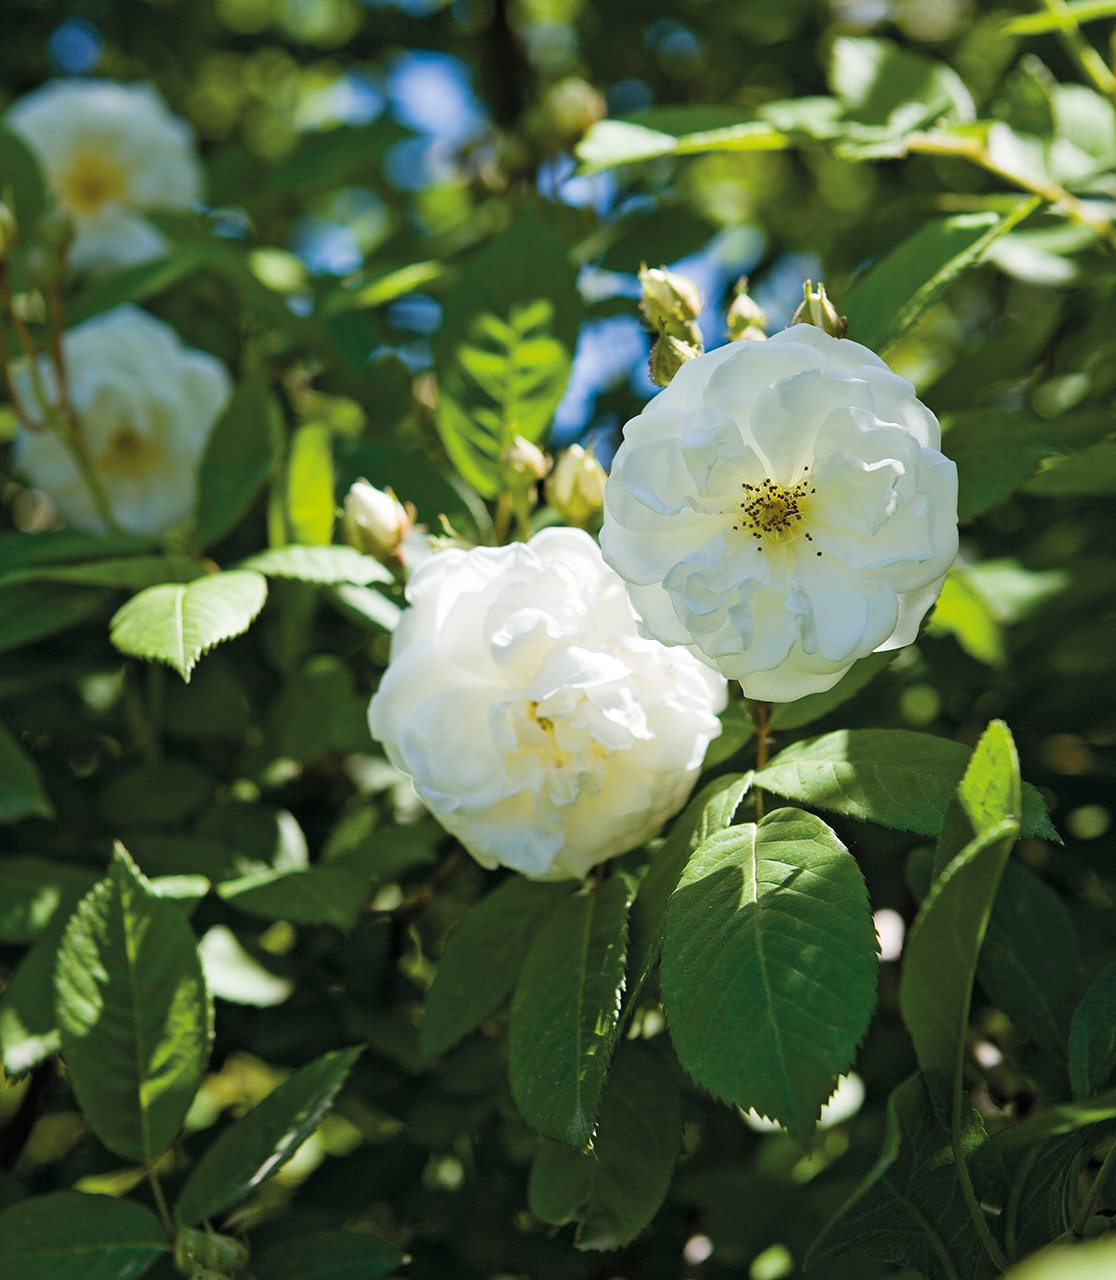 Rosa Nieve de abril